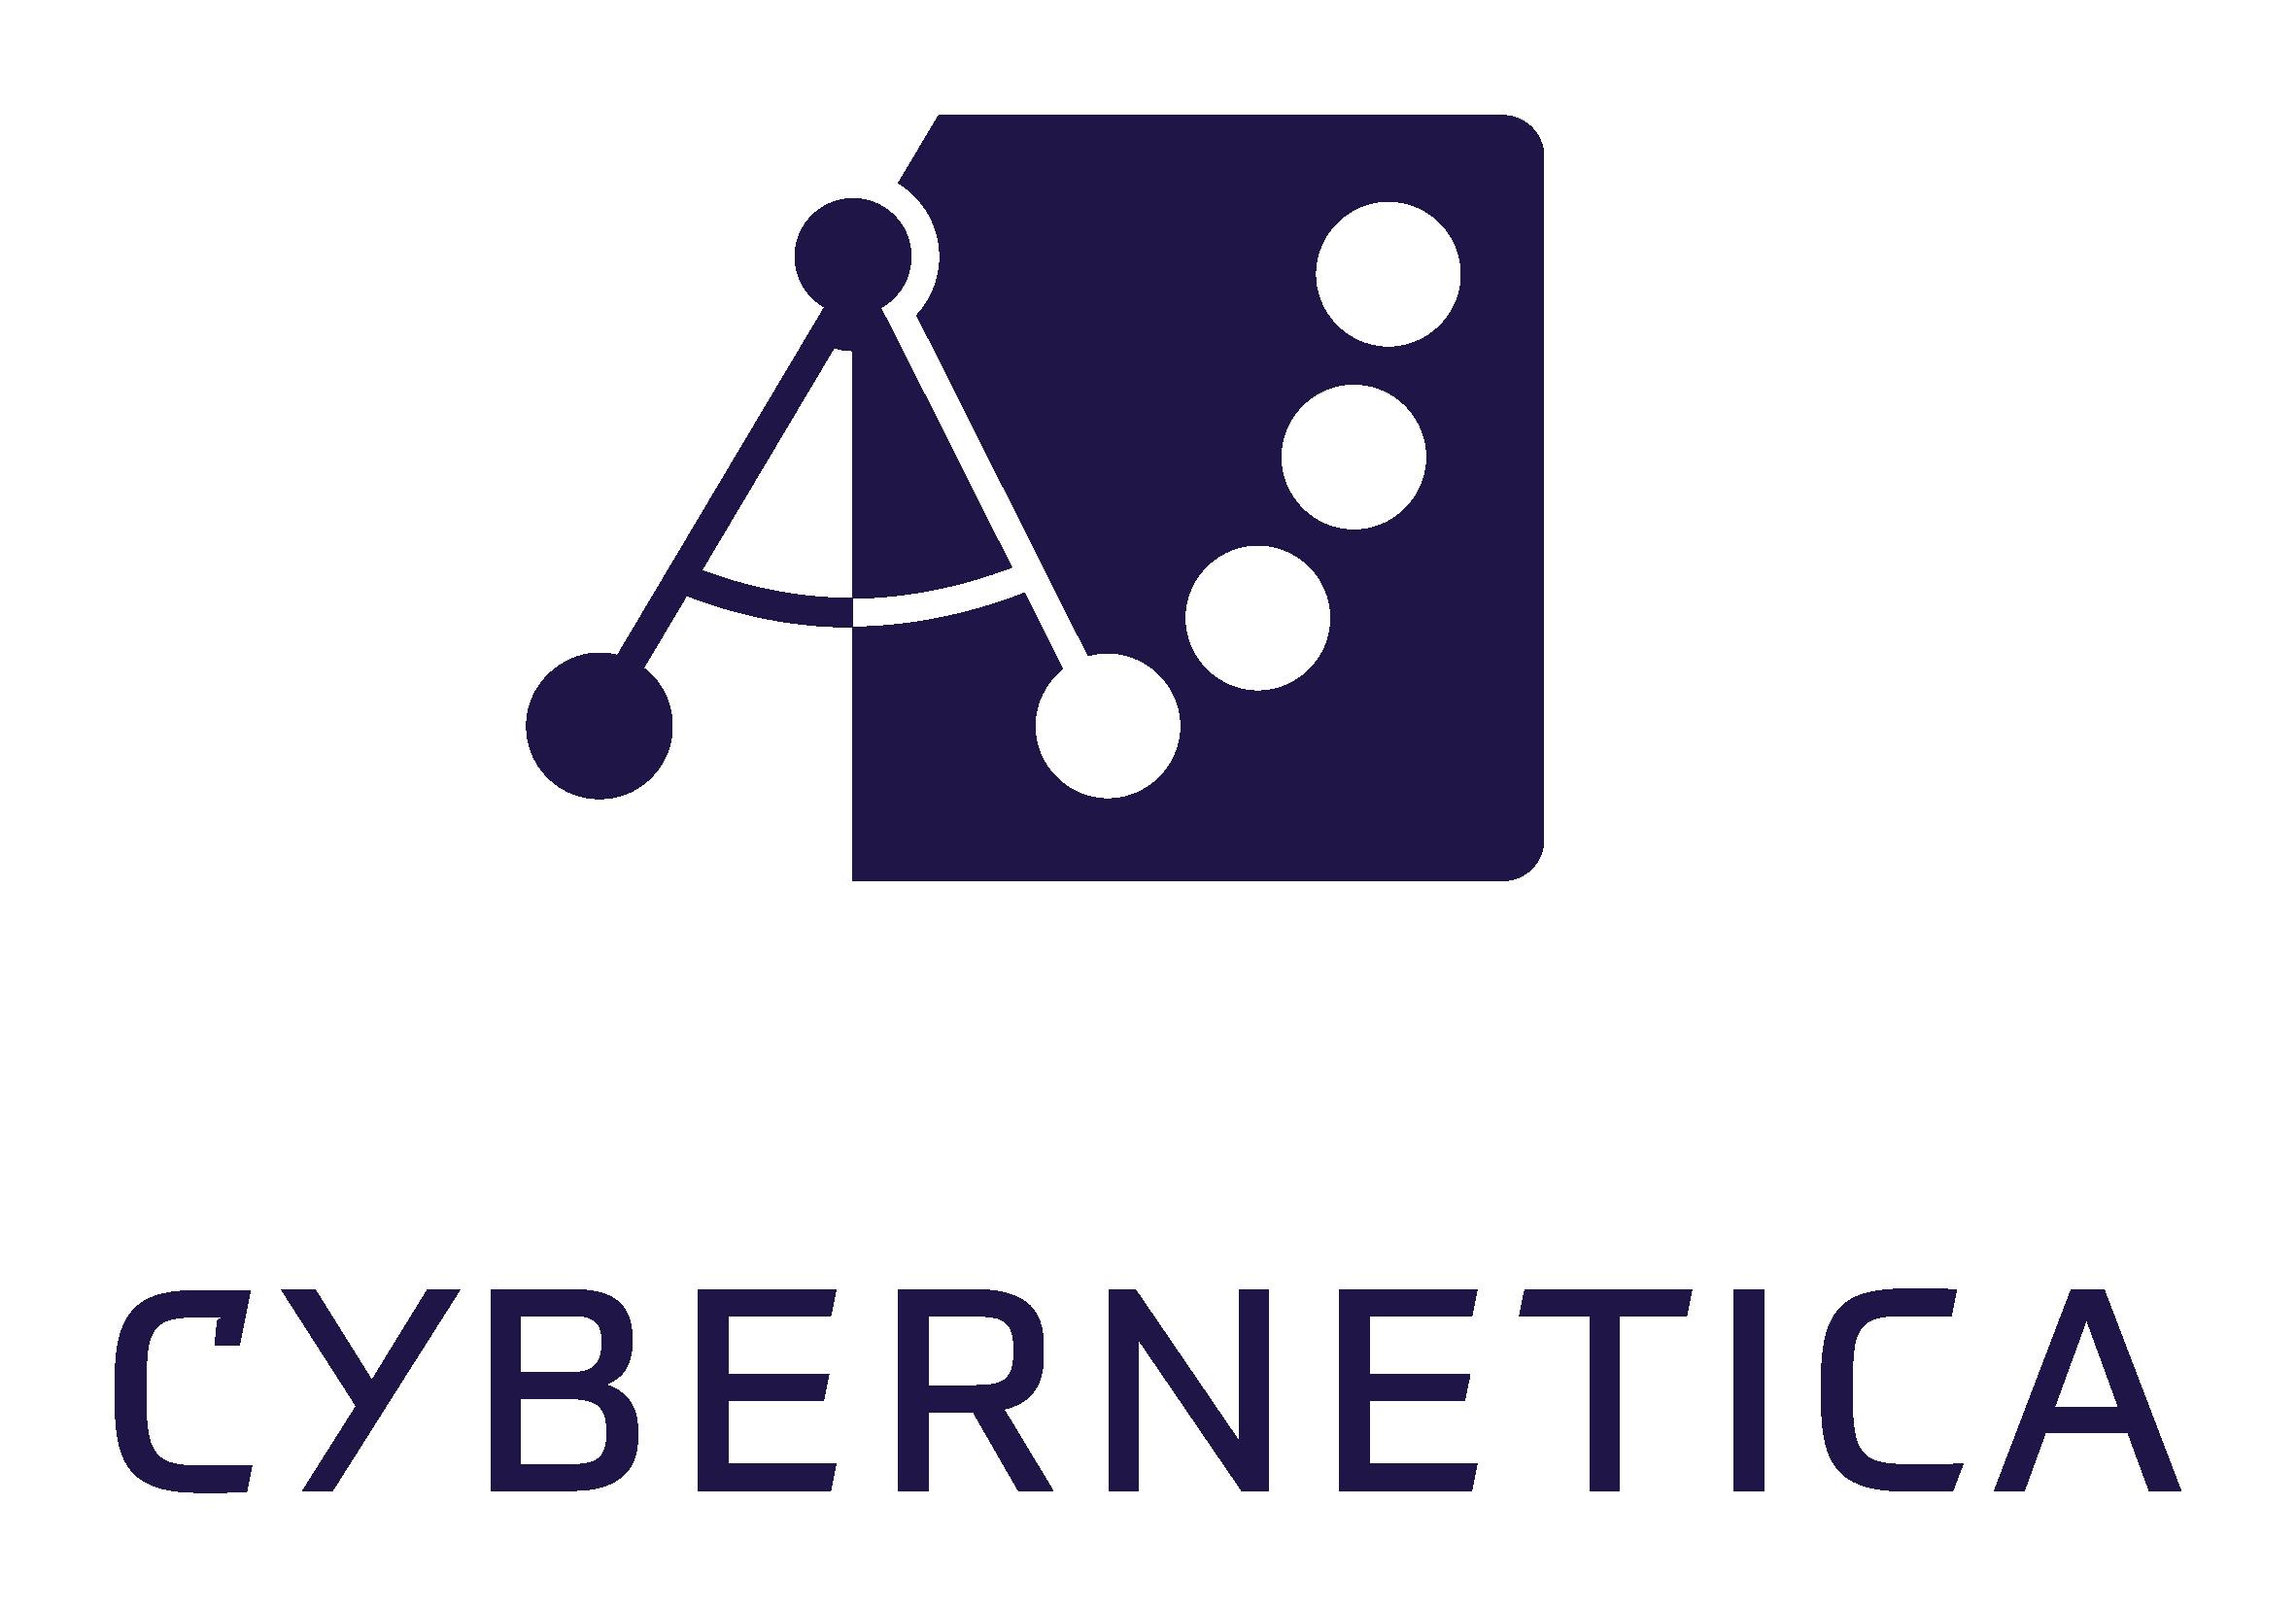 CYBERNETICA logo